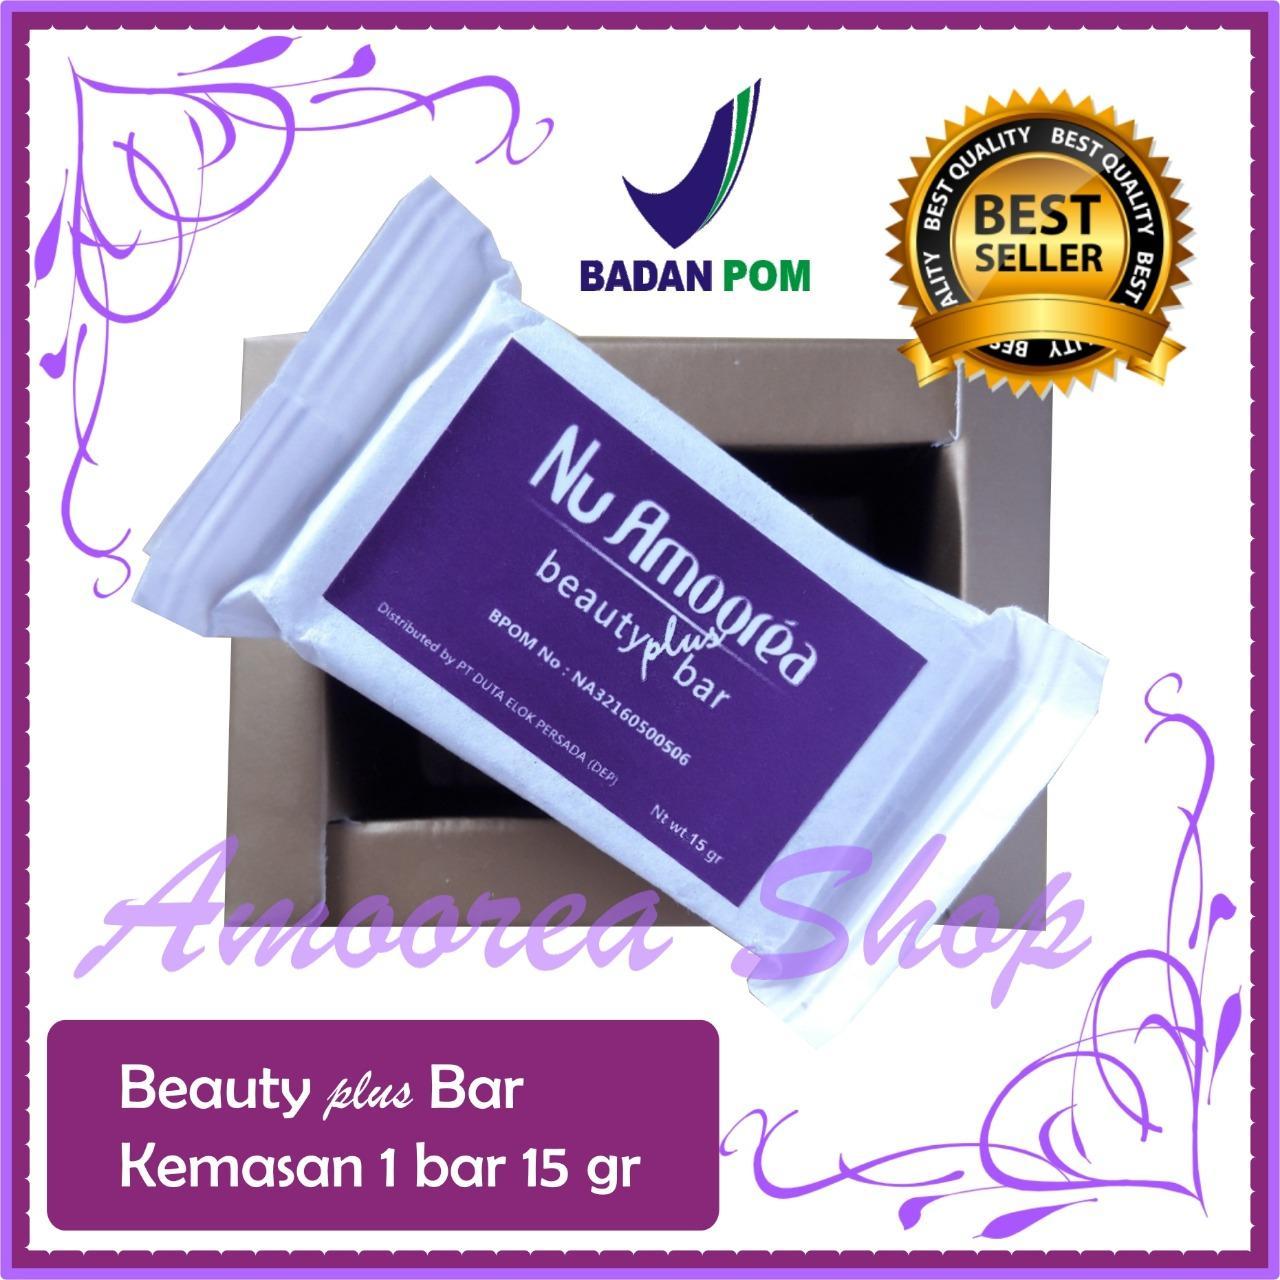 Sabun Amoorea / Beauty Plus Bar / Kemasan 15 gr / Obat Jerawat / Flek Hitam / Komedo / Sabun Cuci Muka / Original